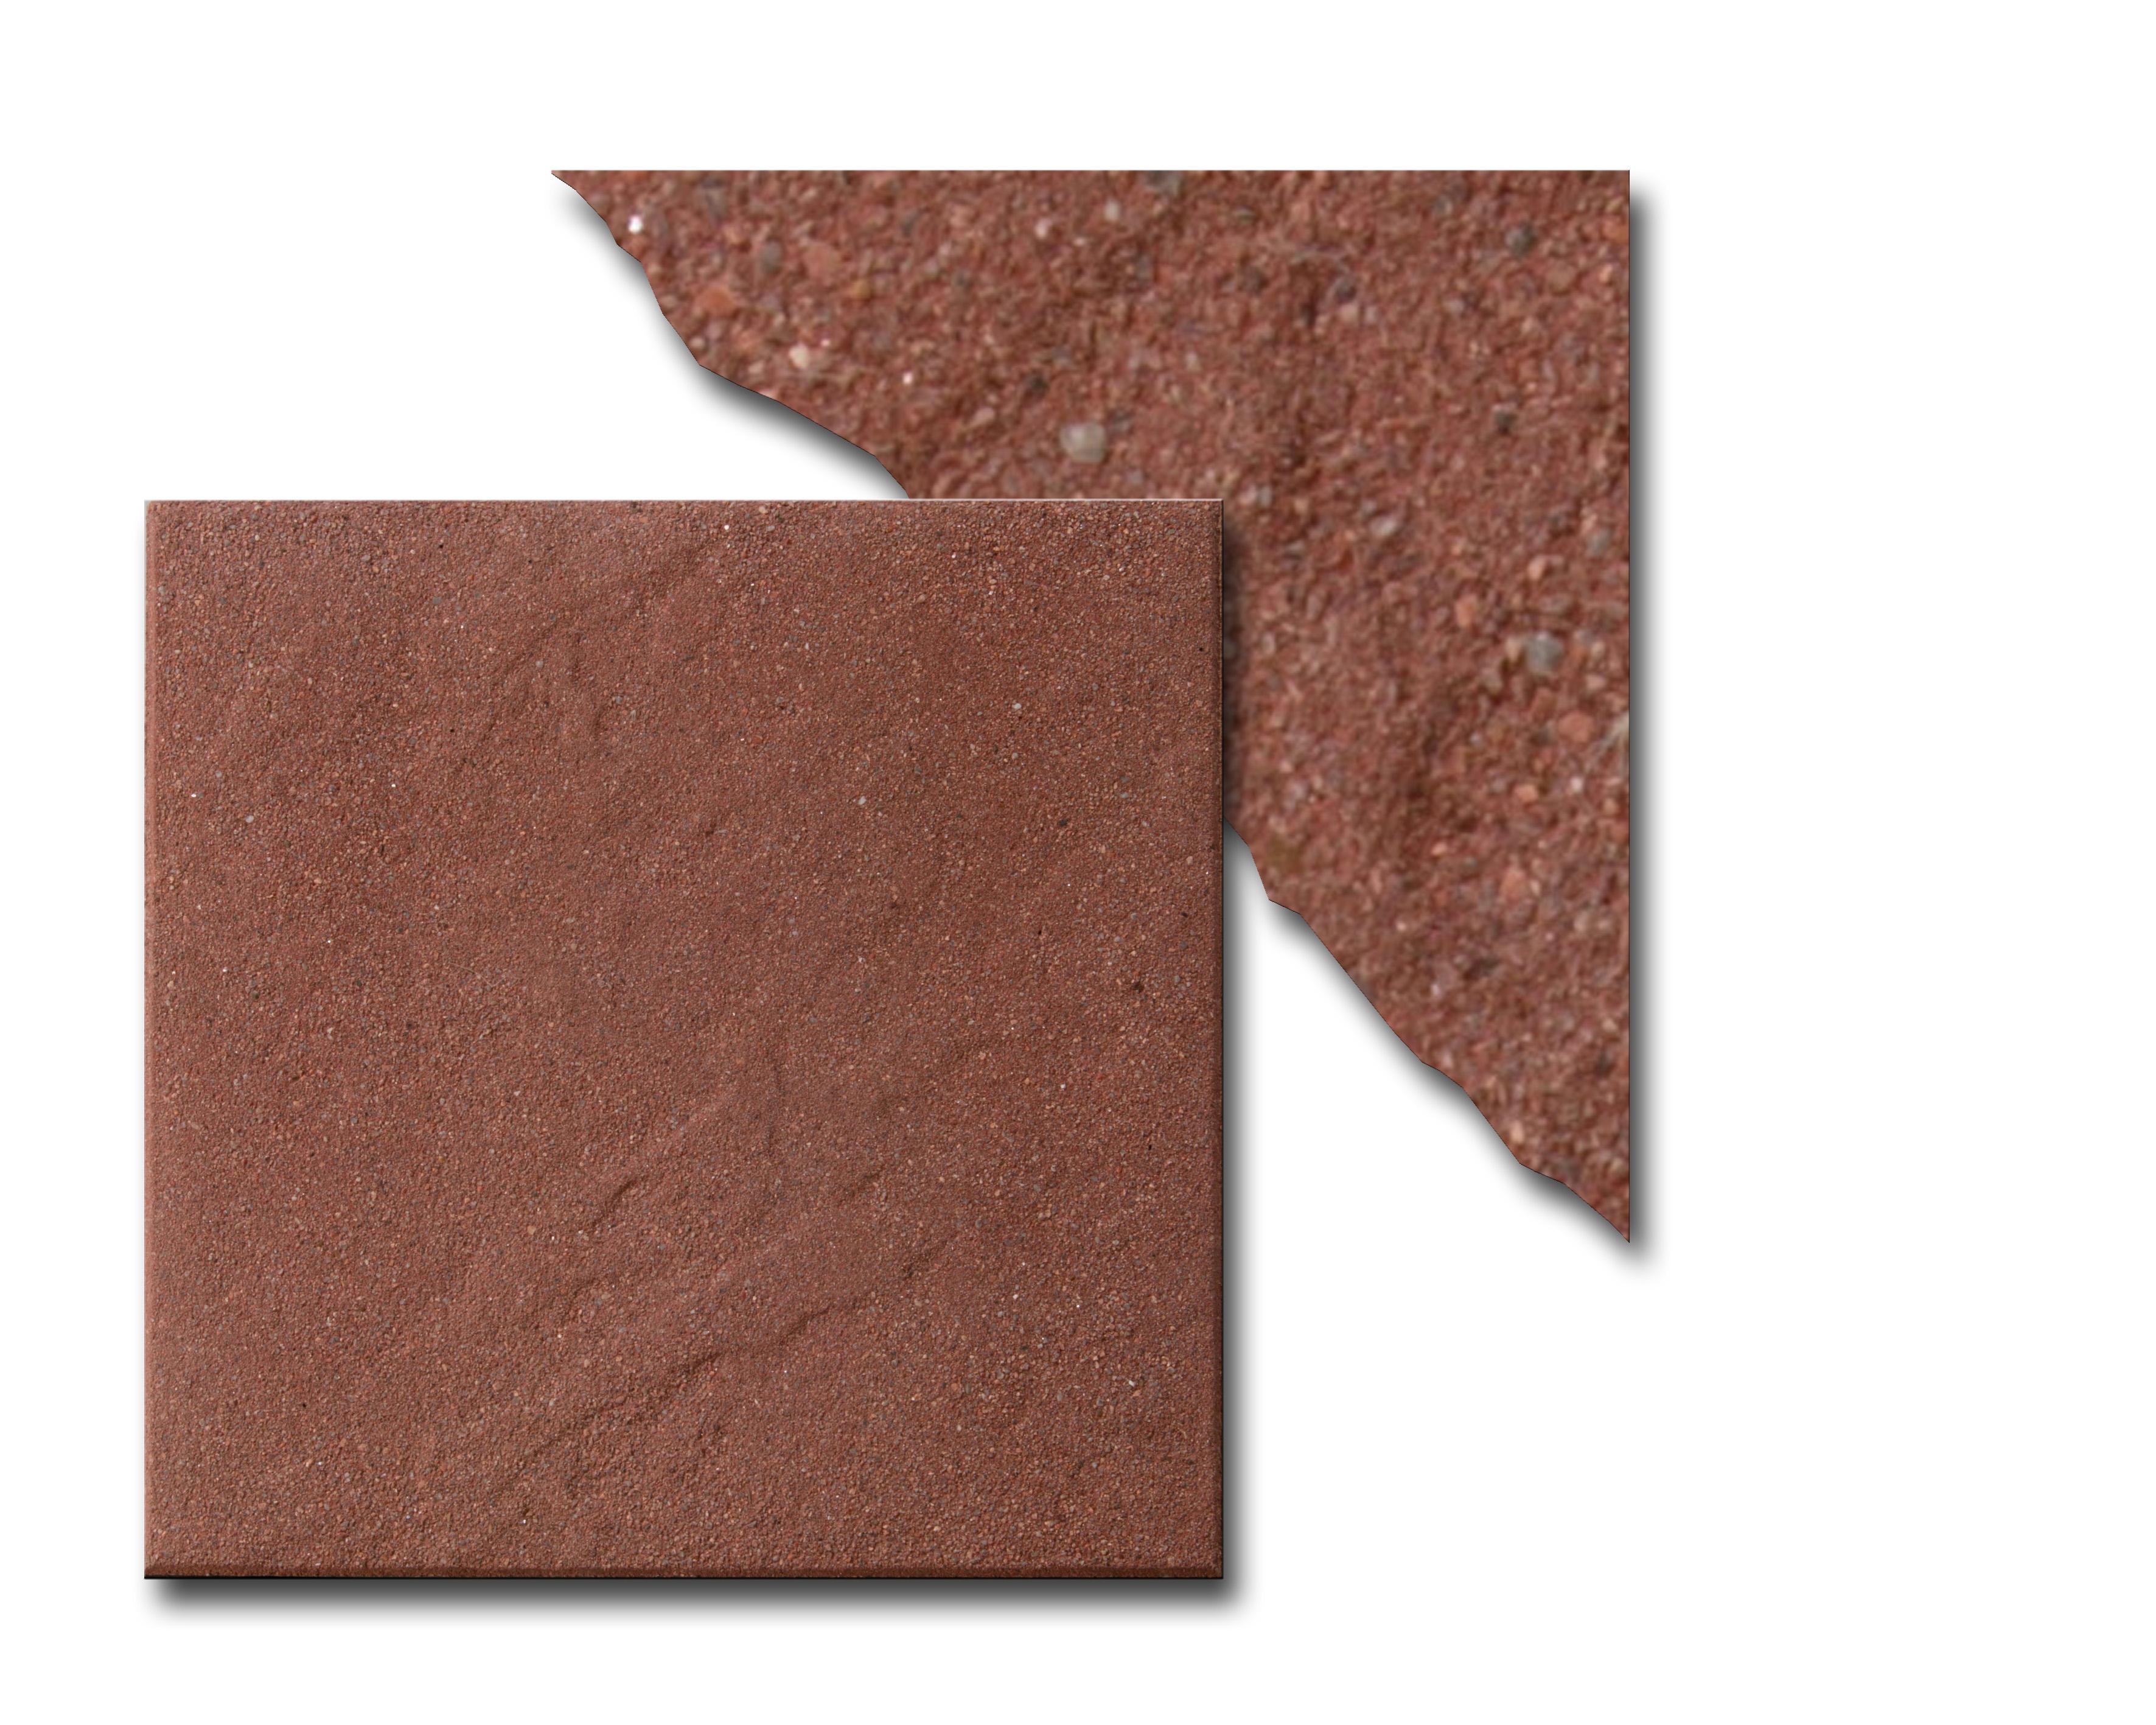 Kemmler Terrassenplatte Xx Mm Terracotta Wwwkemmlerde - Terrassenplatten 40x40 terracotta